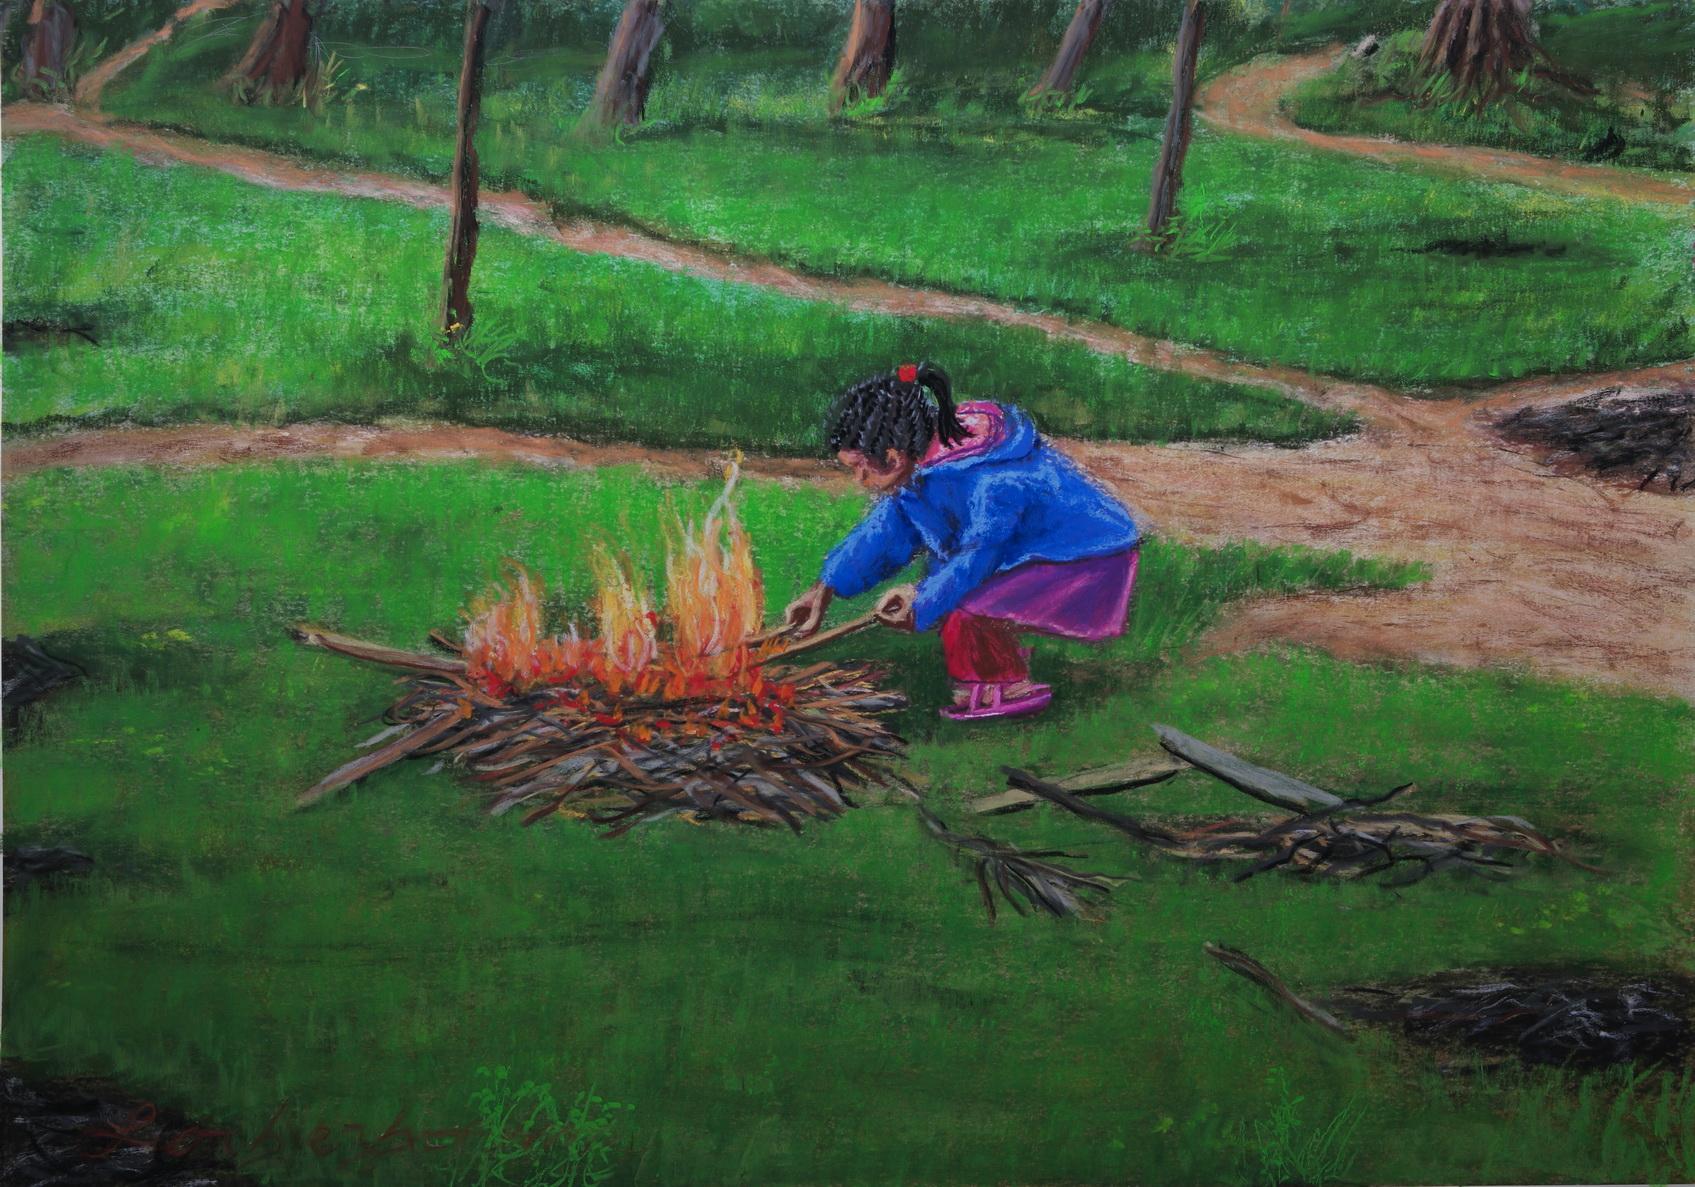 Little girl playing fire, Soft pastel, Koh Lanta, Laos. Lorberboim Soft Pastel Painting.